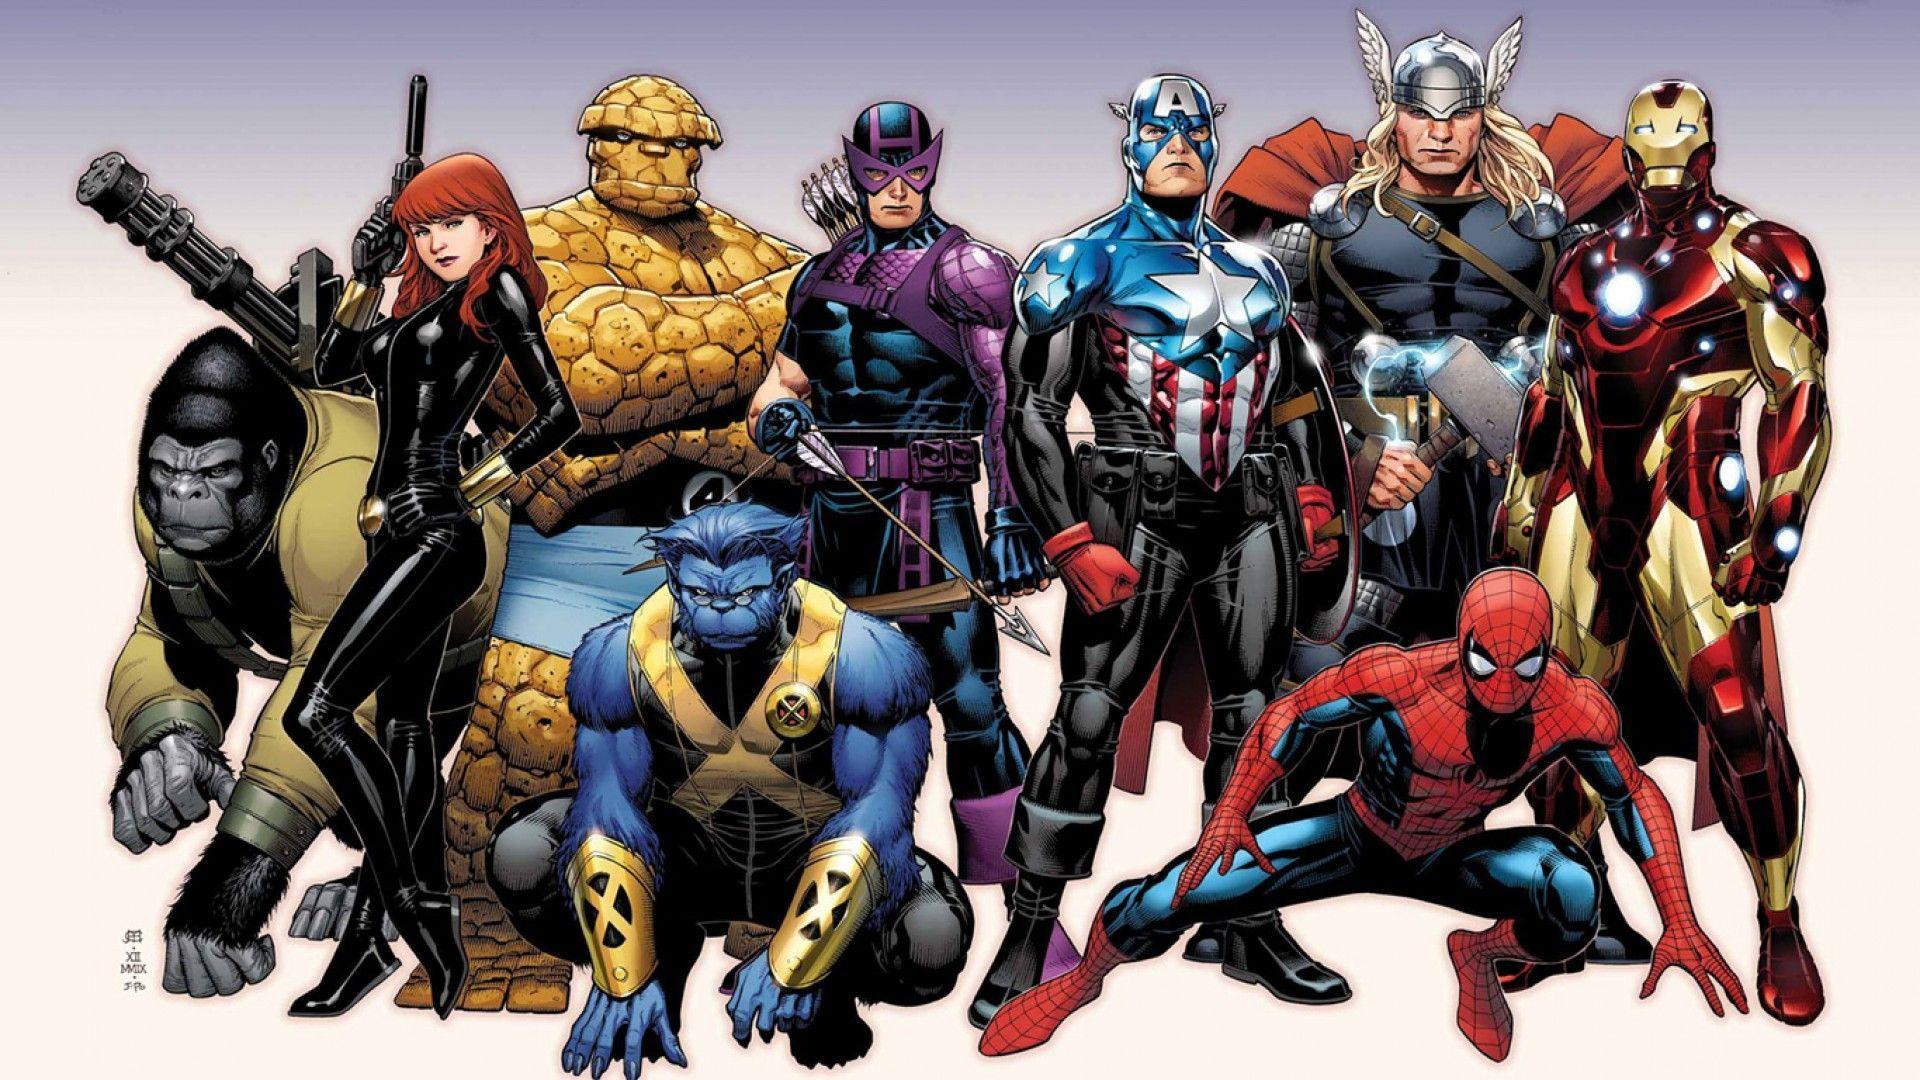 Hd wallpaper hero - Marvel Wallpaper Hd Background Pc